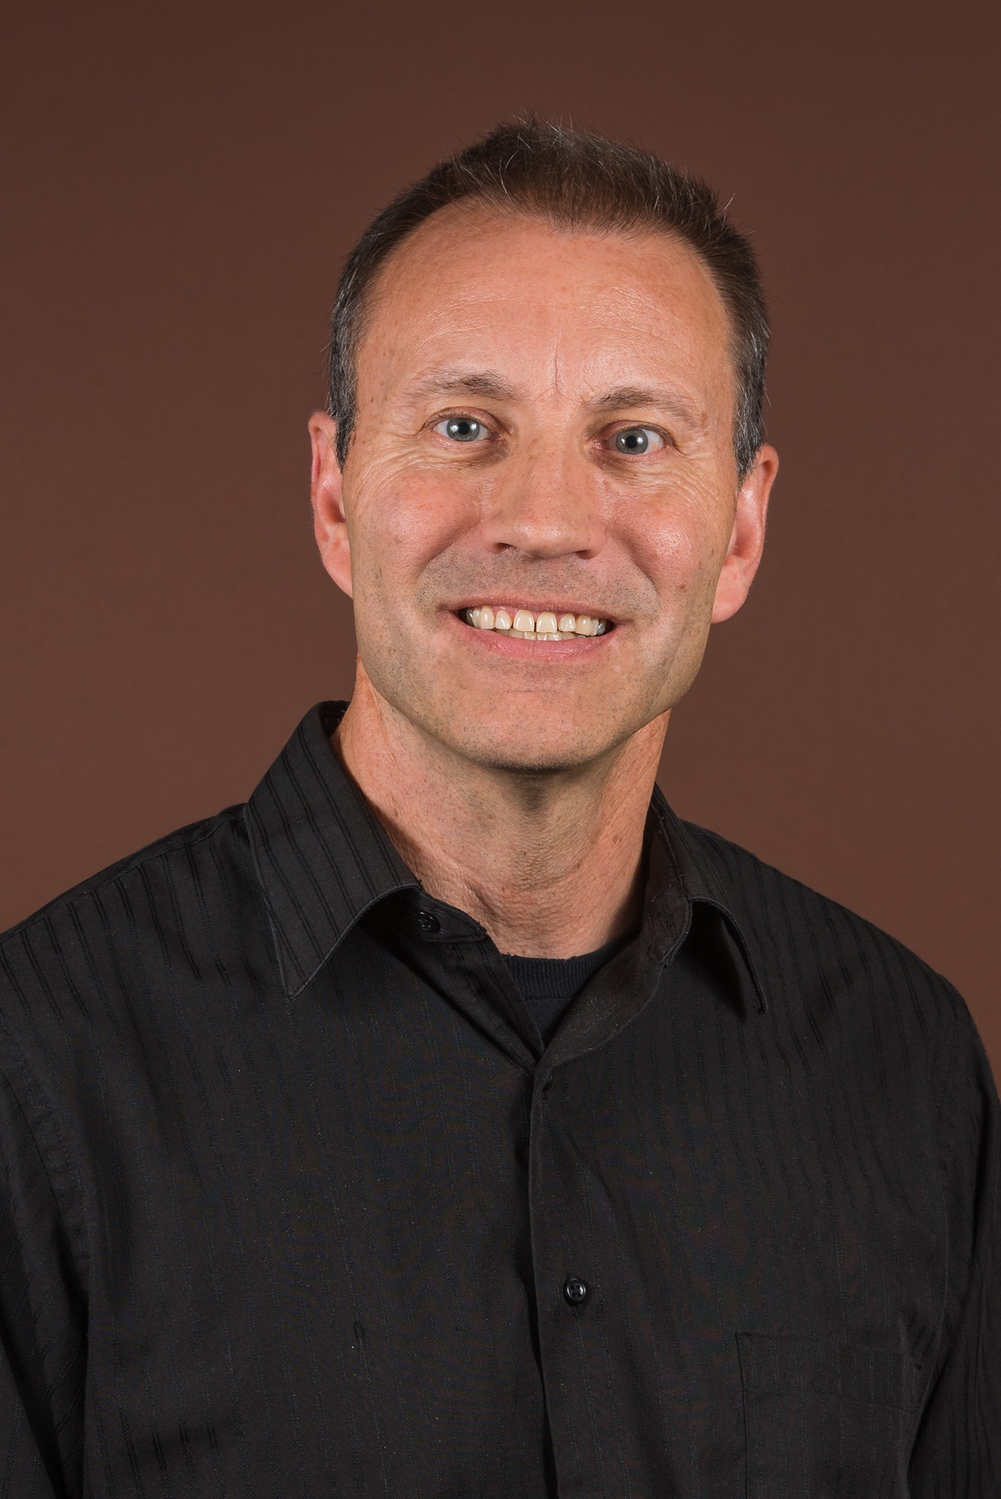 Douglas Cushman, LMSW